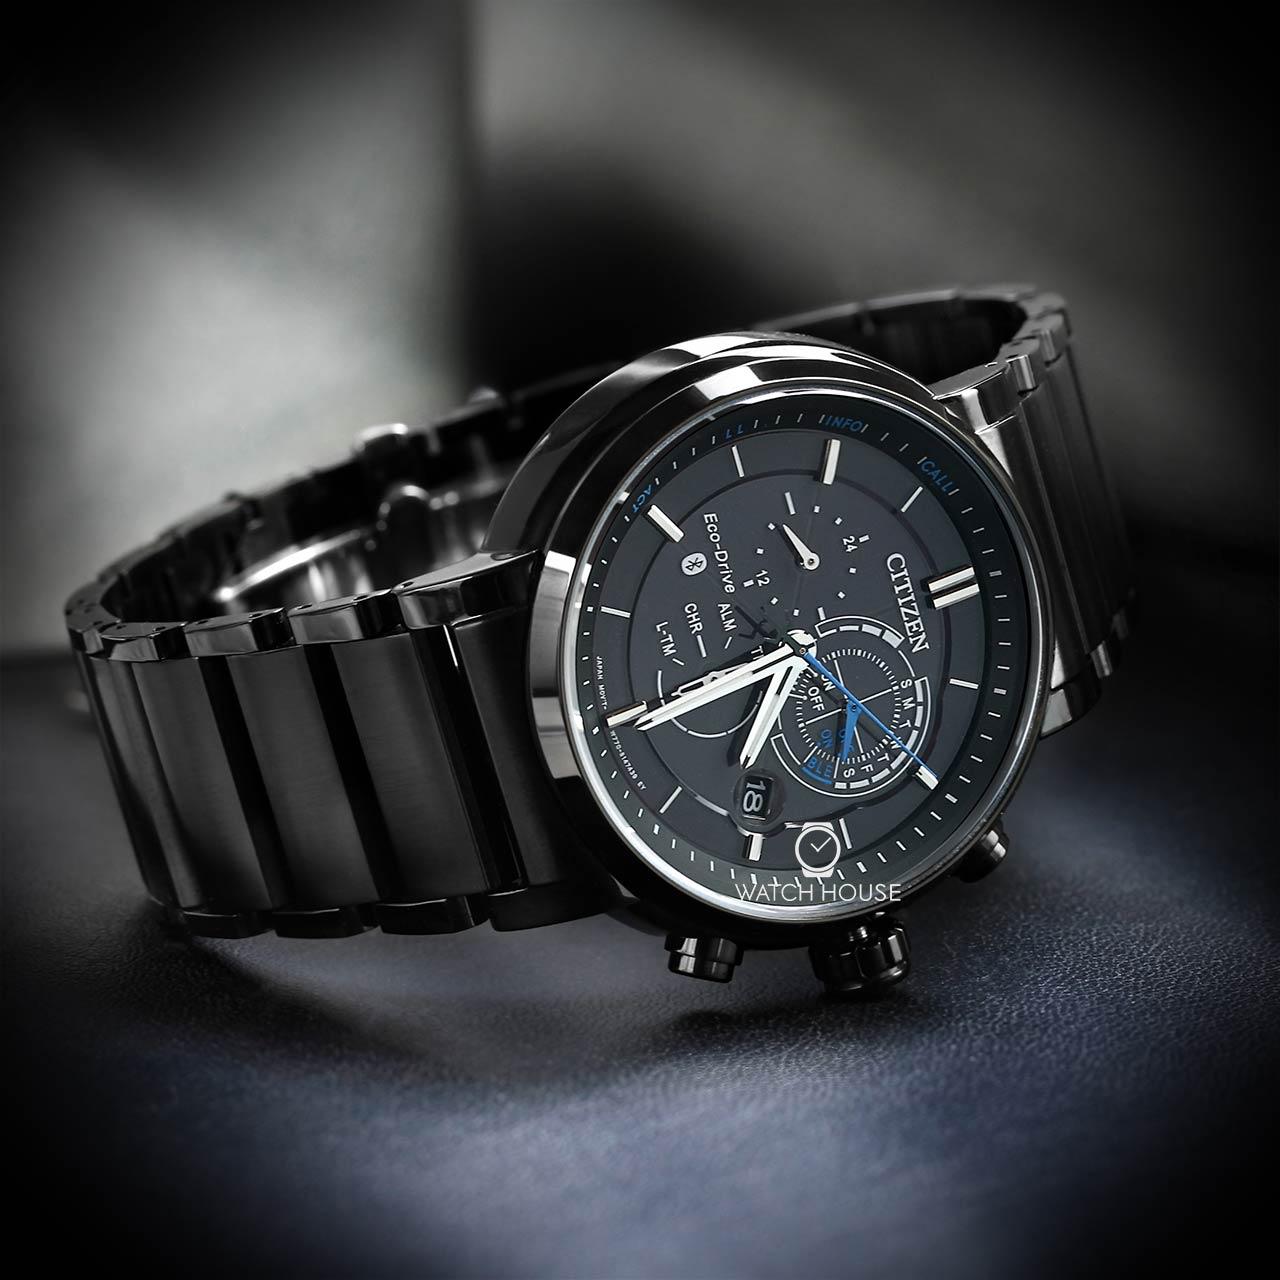 Details Citizen Bz1006 Armbanduhr Herren Uhr About Drive Bluetooth 82e Eco 8Omn0wvN